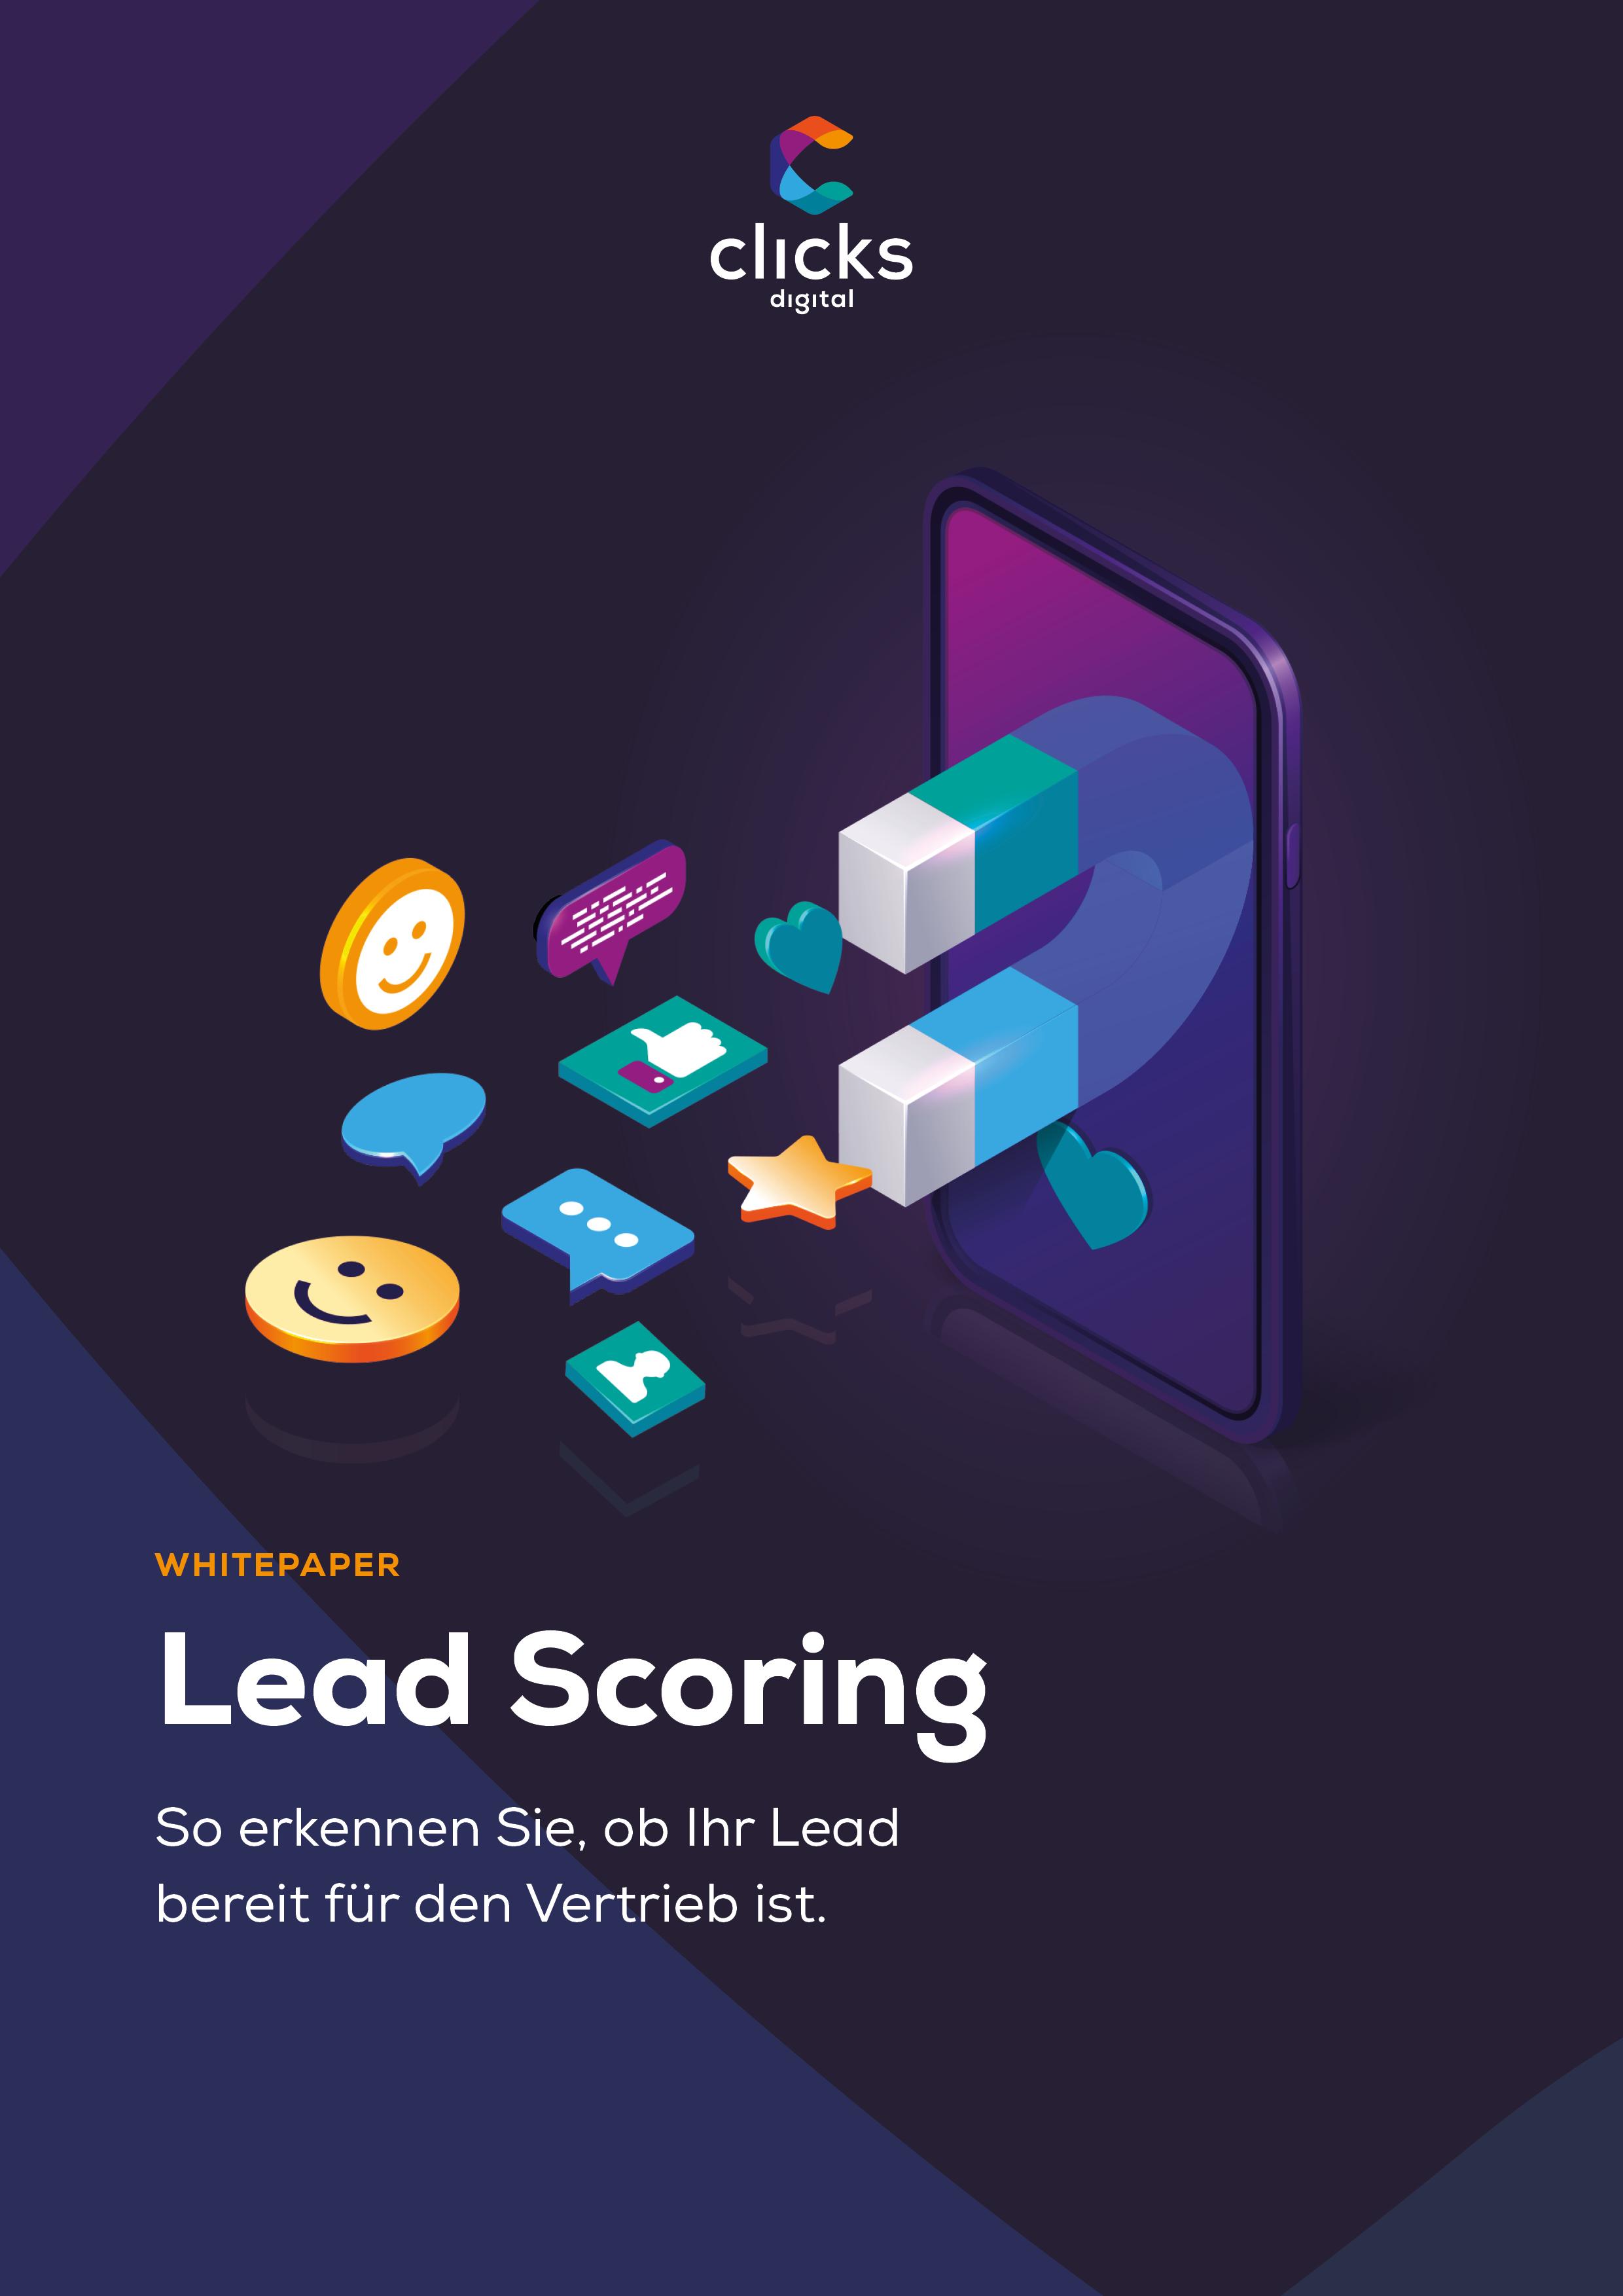 Deckblatt Lead Scoring